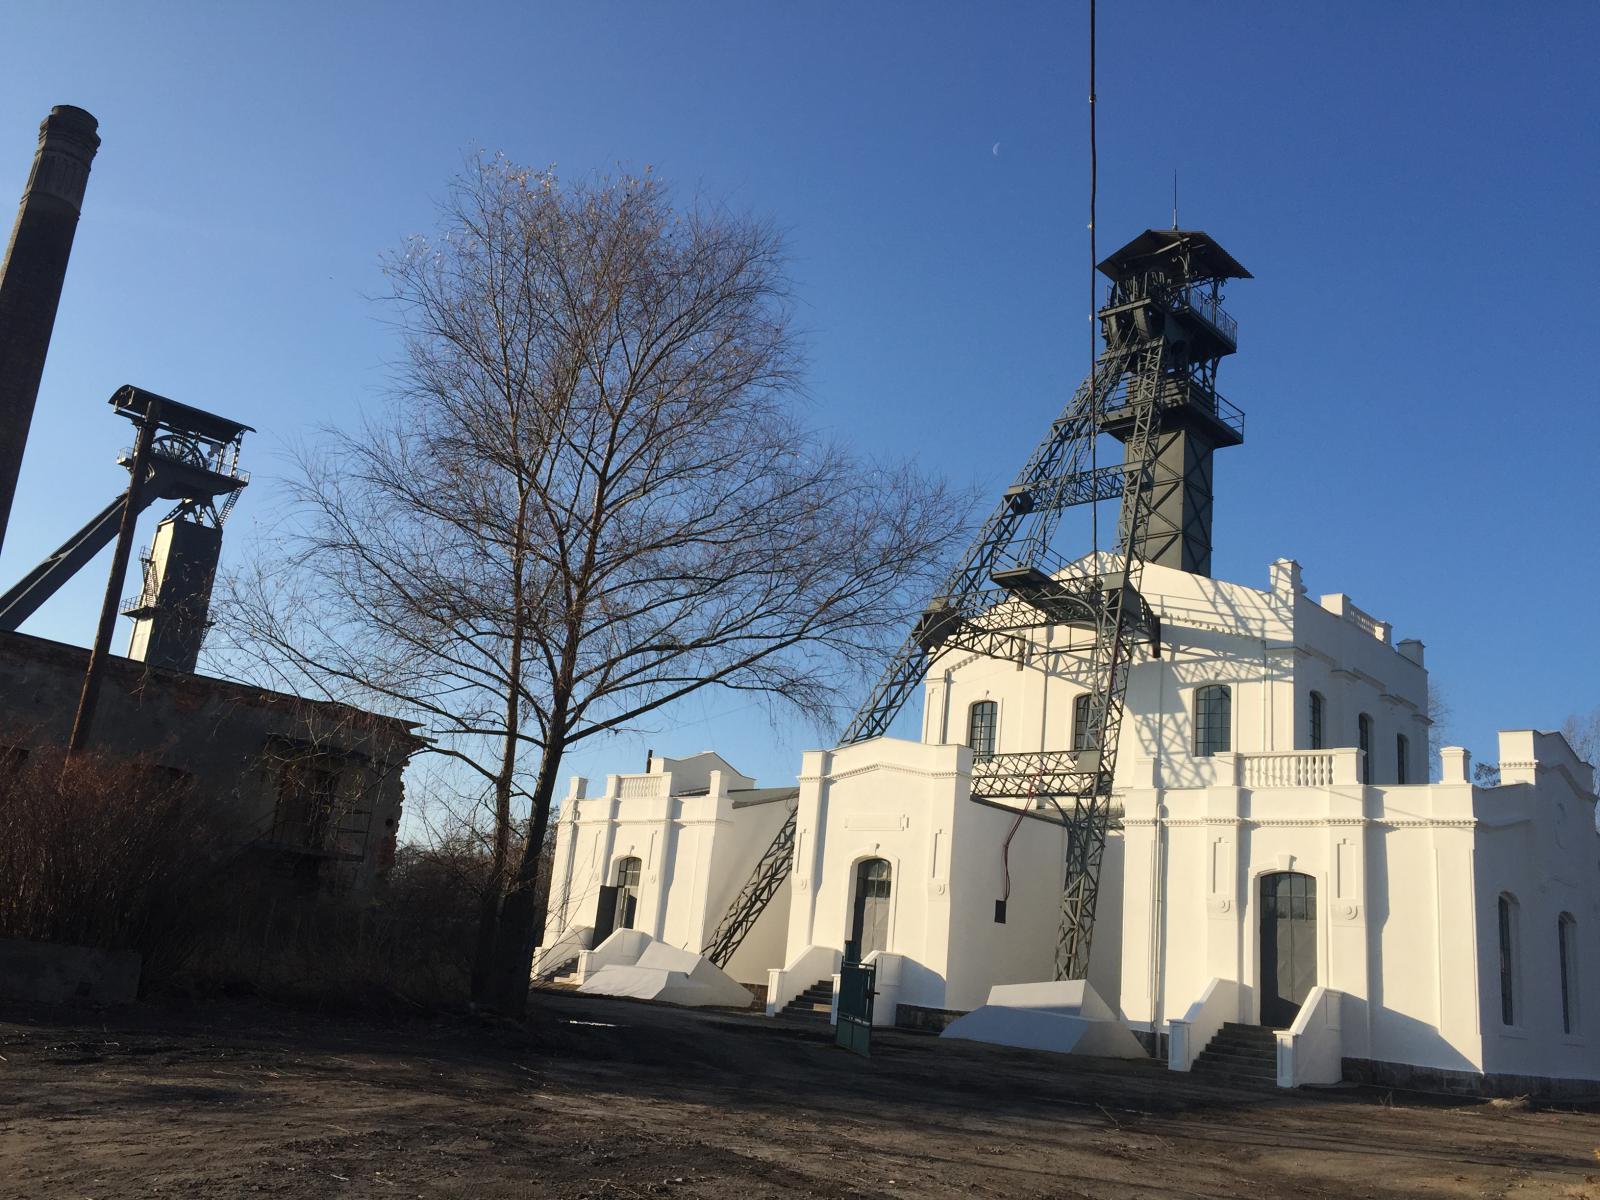 Opravy areálu Dolu Alexander dokončeny